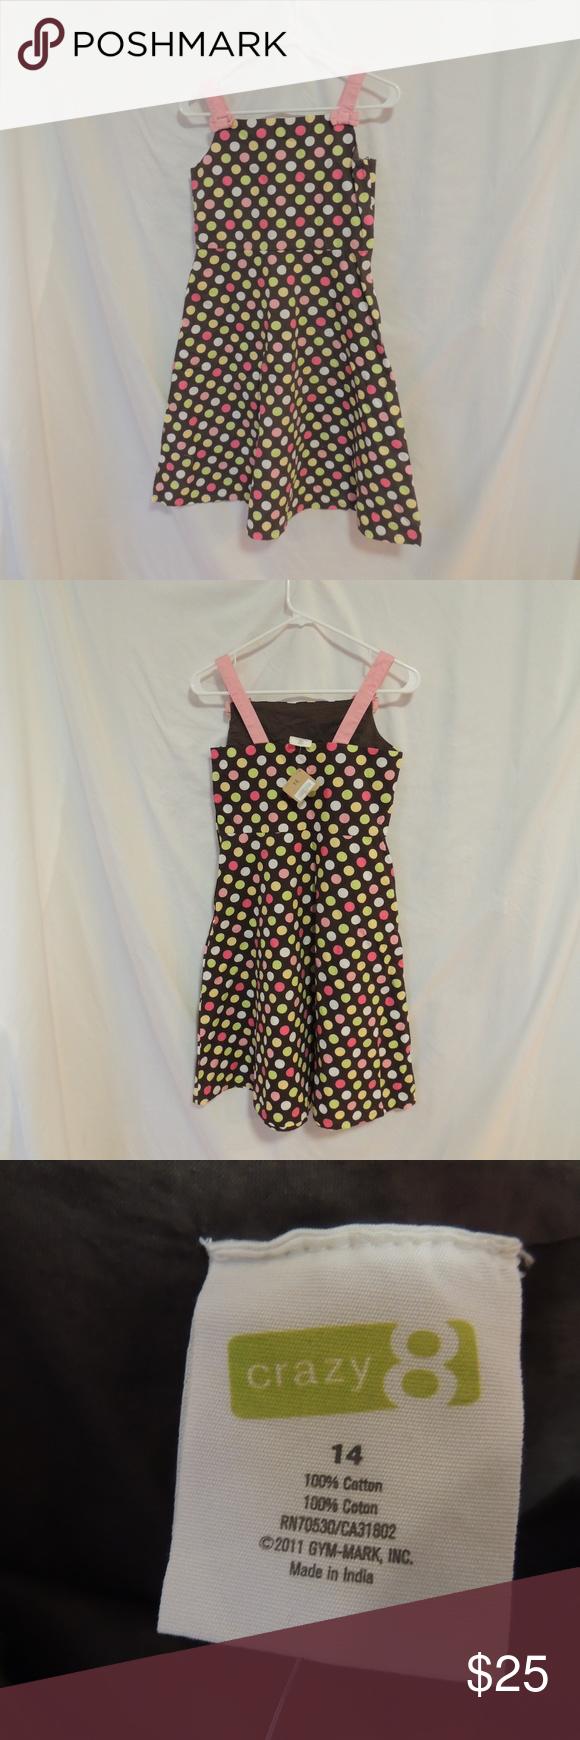 Blue Multi Floral Print Maxi Dress With V Neckline Plus Size 14 16 18 20 22 24 26 28 30 32 34 36 Maxi Dress Short Maxi Dress Long Summer Dresses [ 1700 x 1133 Pixel ]